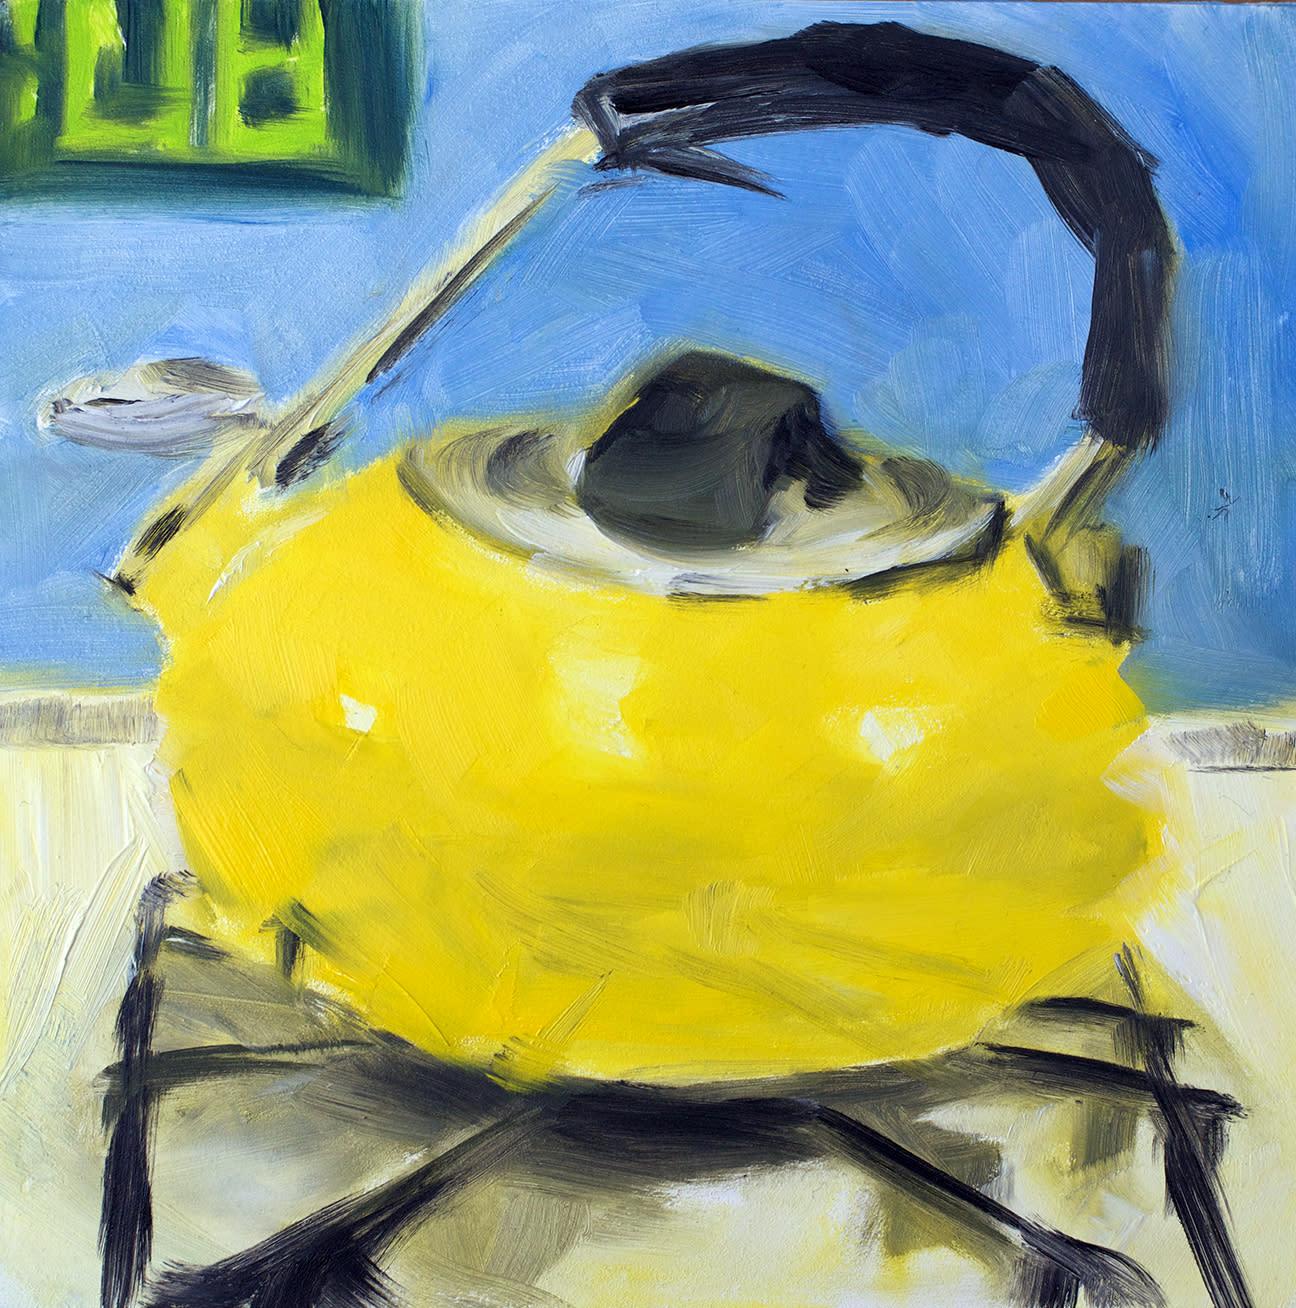 Yellow tea kettle by paul william artist tm2juv